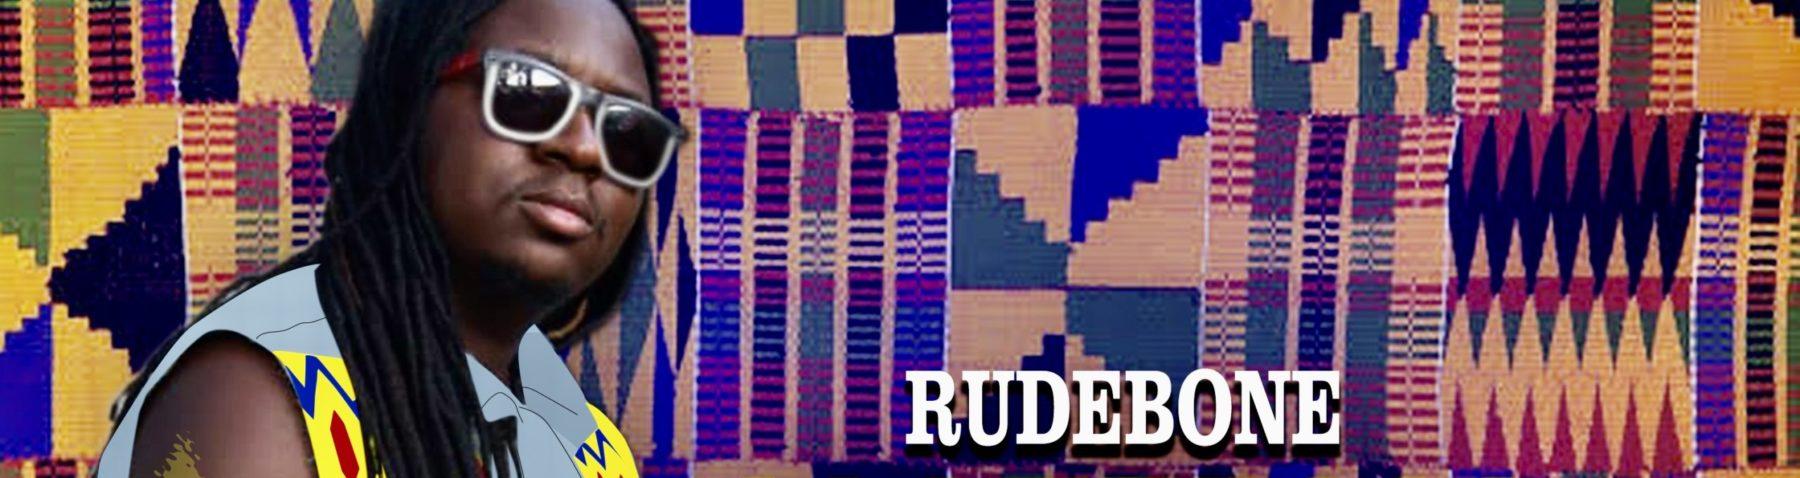 Rudebone